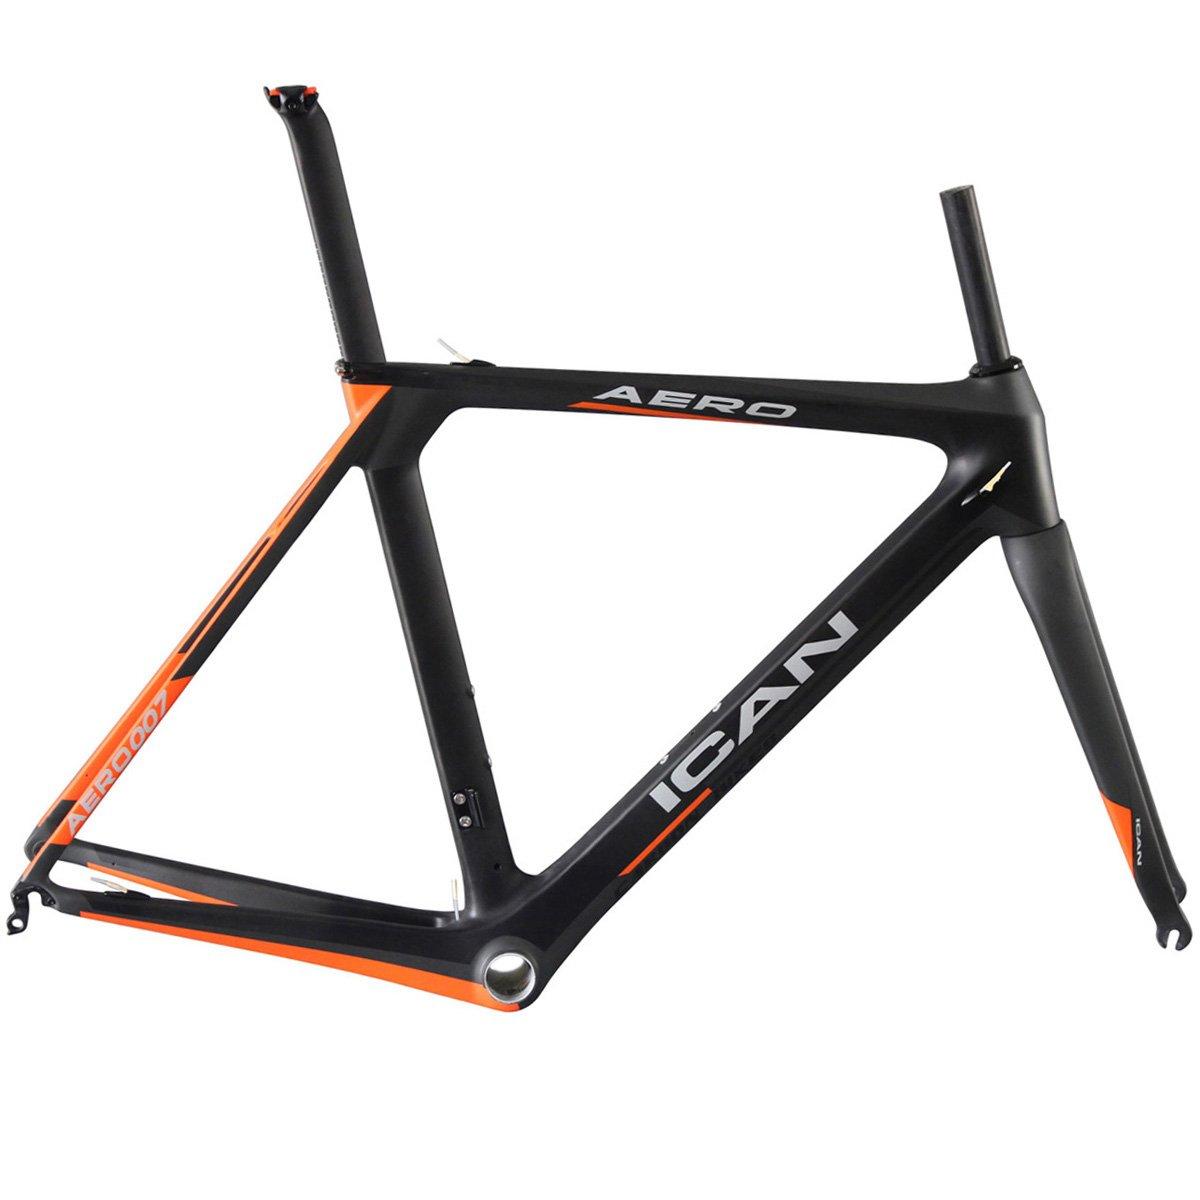 ICAN(アイカン) 超轻量エアロ カーボン ロードバイク フレームセット 50/52/54/56/58cm 空気力学的なデザイン オレンジ塗装 フレームの重量は約1270g B01DEOQGDS 52cm